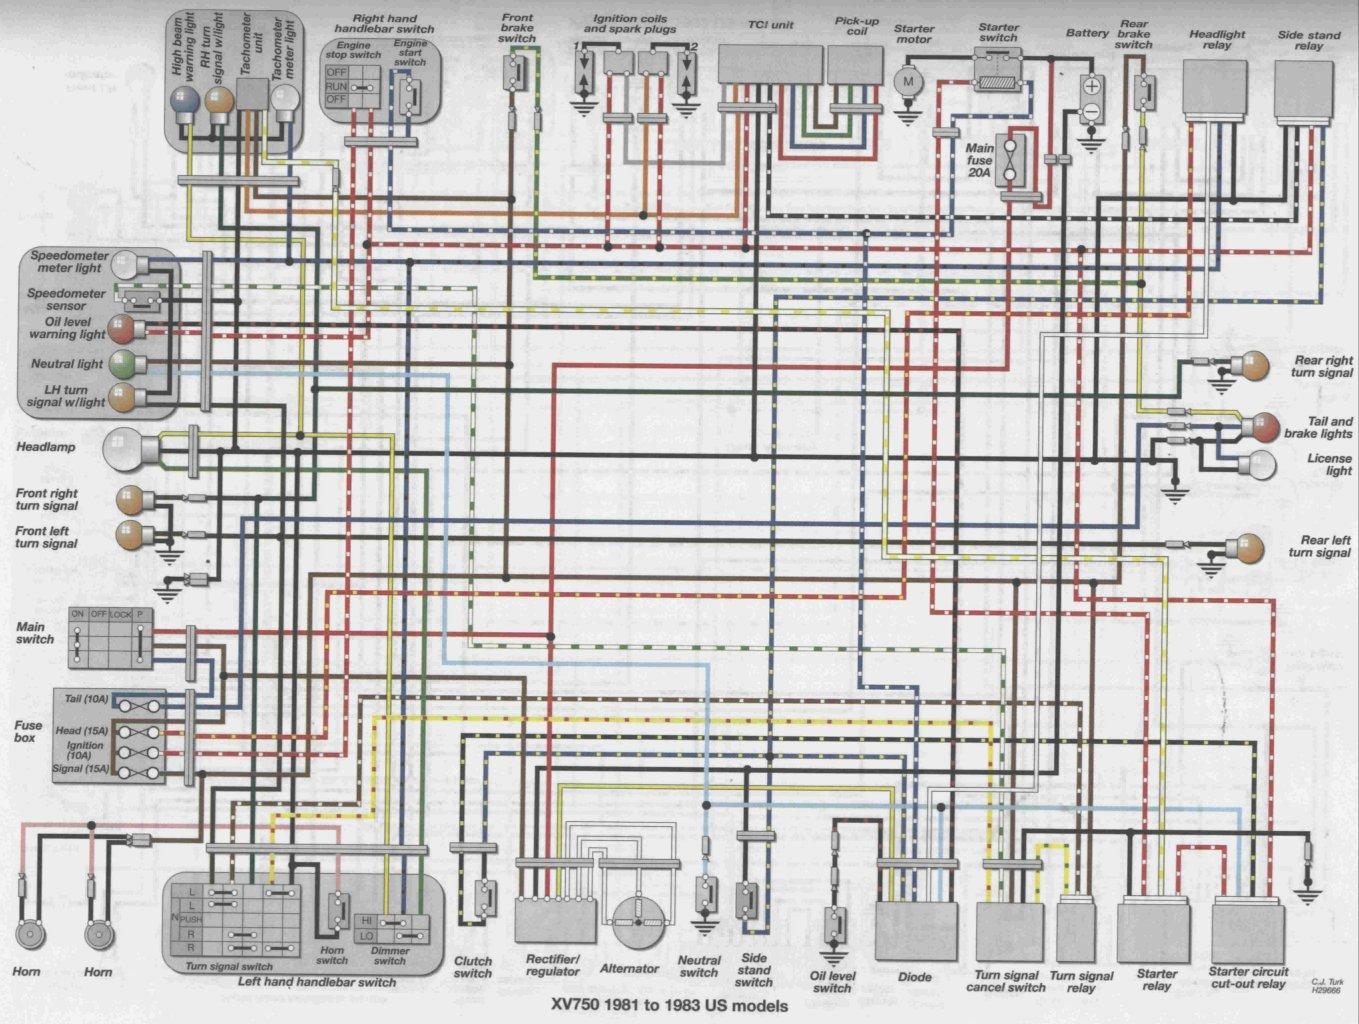 81_83_us_XV750?resize=640%2C482 82 yamaha virago 750 wiring diagram 82 wiring diagrams collection 1982 yamaha virago 750 wiring harness at aneh.co